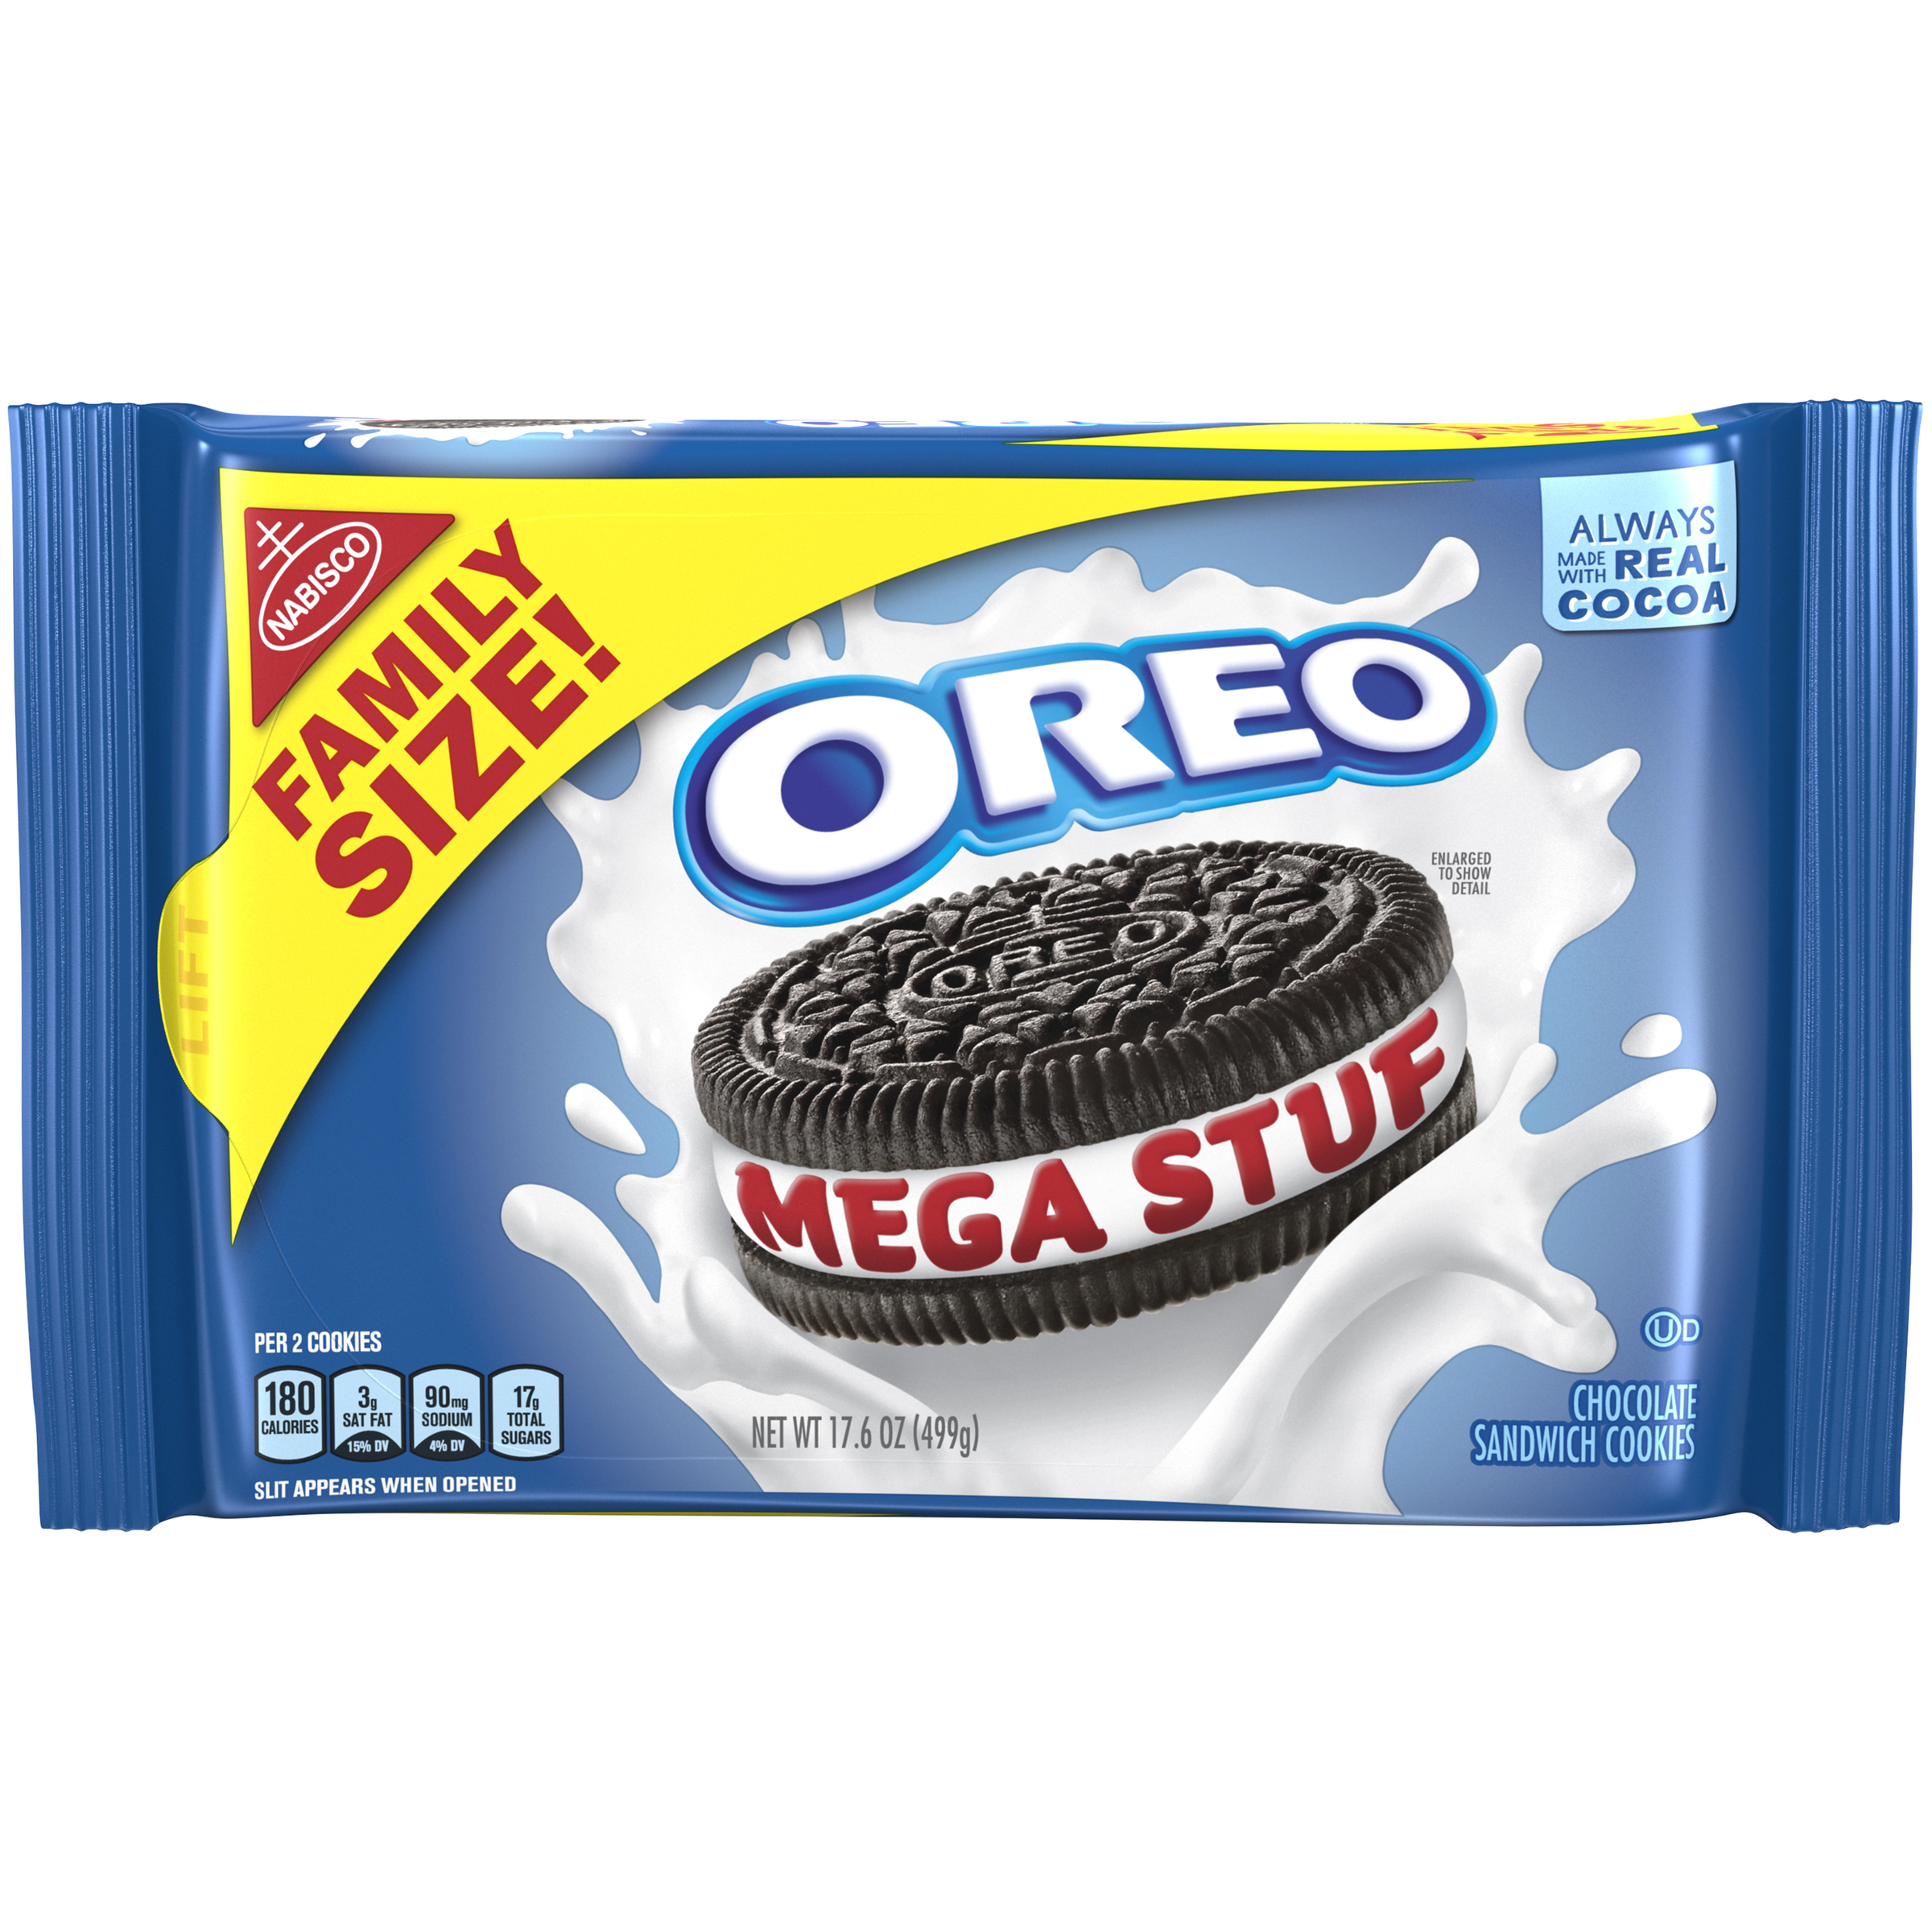 OREO Mega Stuff Sandwich Cookies 17.6 oz